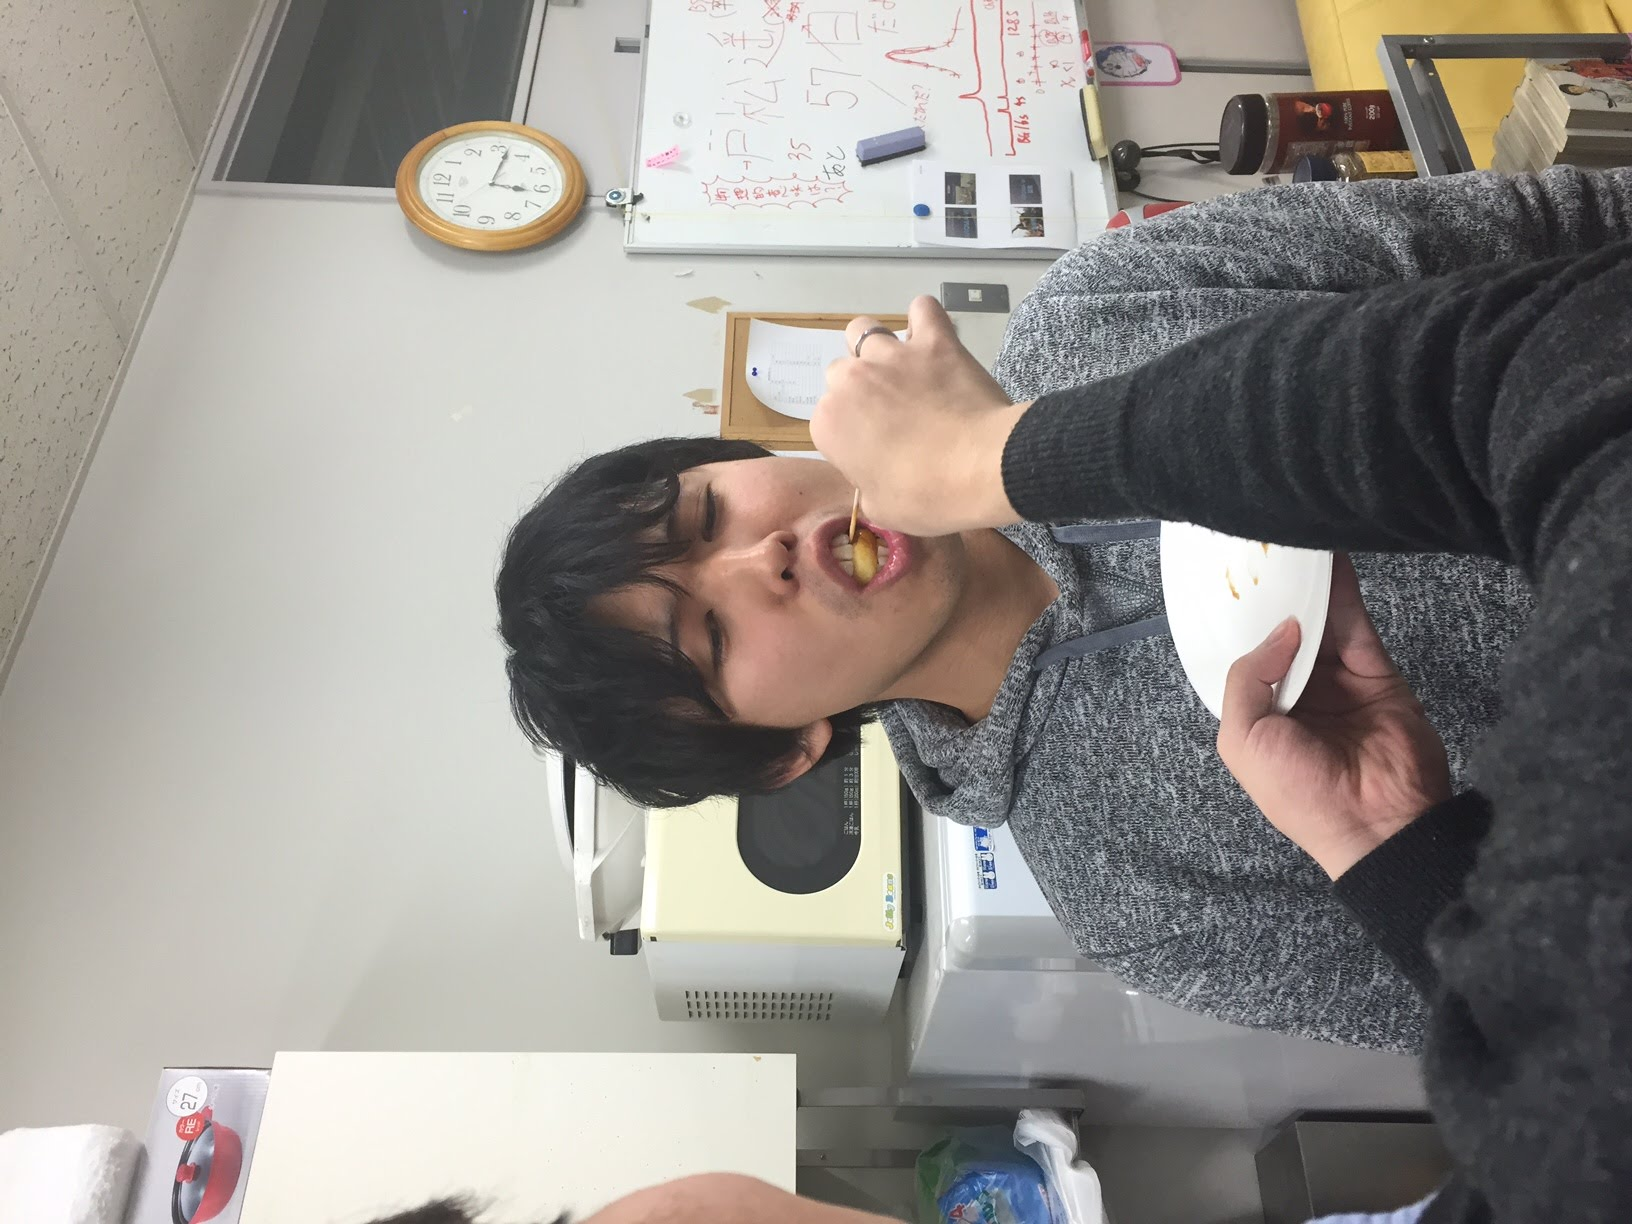 https://4310b1a9-a-c2f1267d-s-sites.googlegroups.com/a/yoshida-agu.net/home/dairy-of-yoshida-lab/_draft_post-5/tako2.JPG?attachauth=ANoY7cpk6JK9UAjTVFbYeEdVZWCtPA-h-WKaWTVpRi22eBWX6bqwtPl5ru5oZpR0GCuJHB-QrenzqmCgMx6knhtdMjf1ip9_l-8xrvWg8z4pB3SHjvRfnHHPUIcV463xzsLzLGjYaw9fB6lMdFi-bEZ0c6g6Z4qYTfxKfnfVE0i-rbBJYmHVPFTpXjKDVeqRvFjLMPVkAd1Hl5PFEdk4_d0NKJLw791WI4R6BoBNw6J1byyn7nZYvZ4_XK98QYok6u54NpomeFdv&attredirects=0